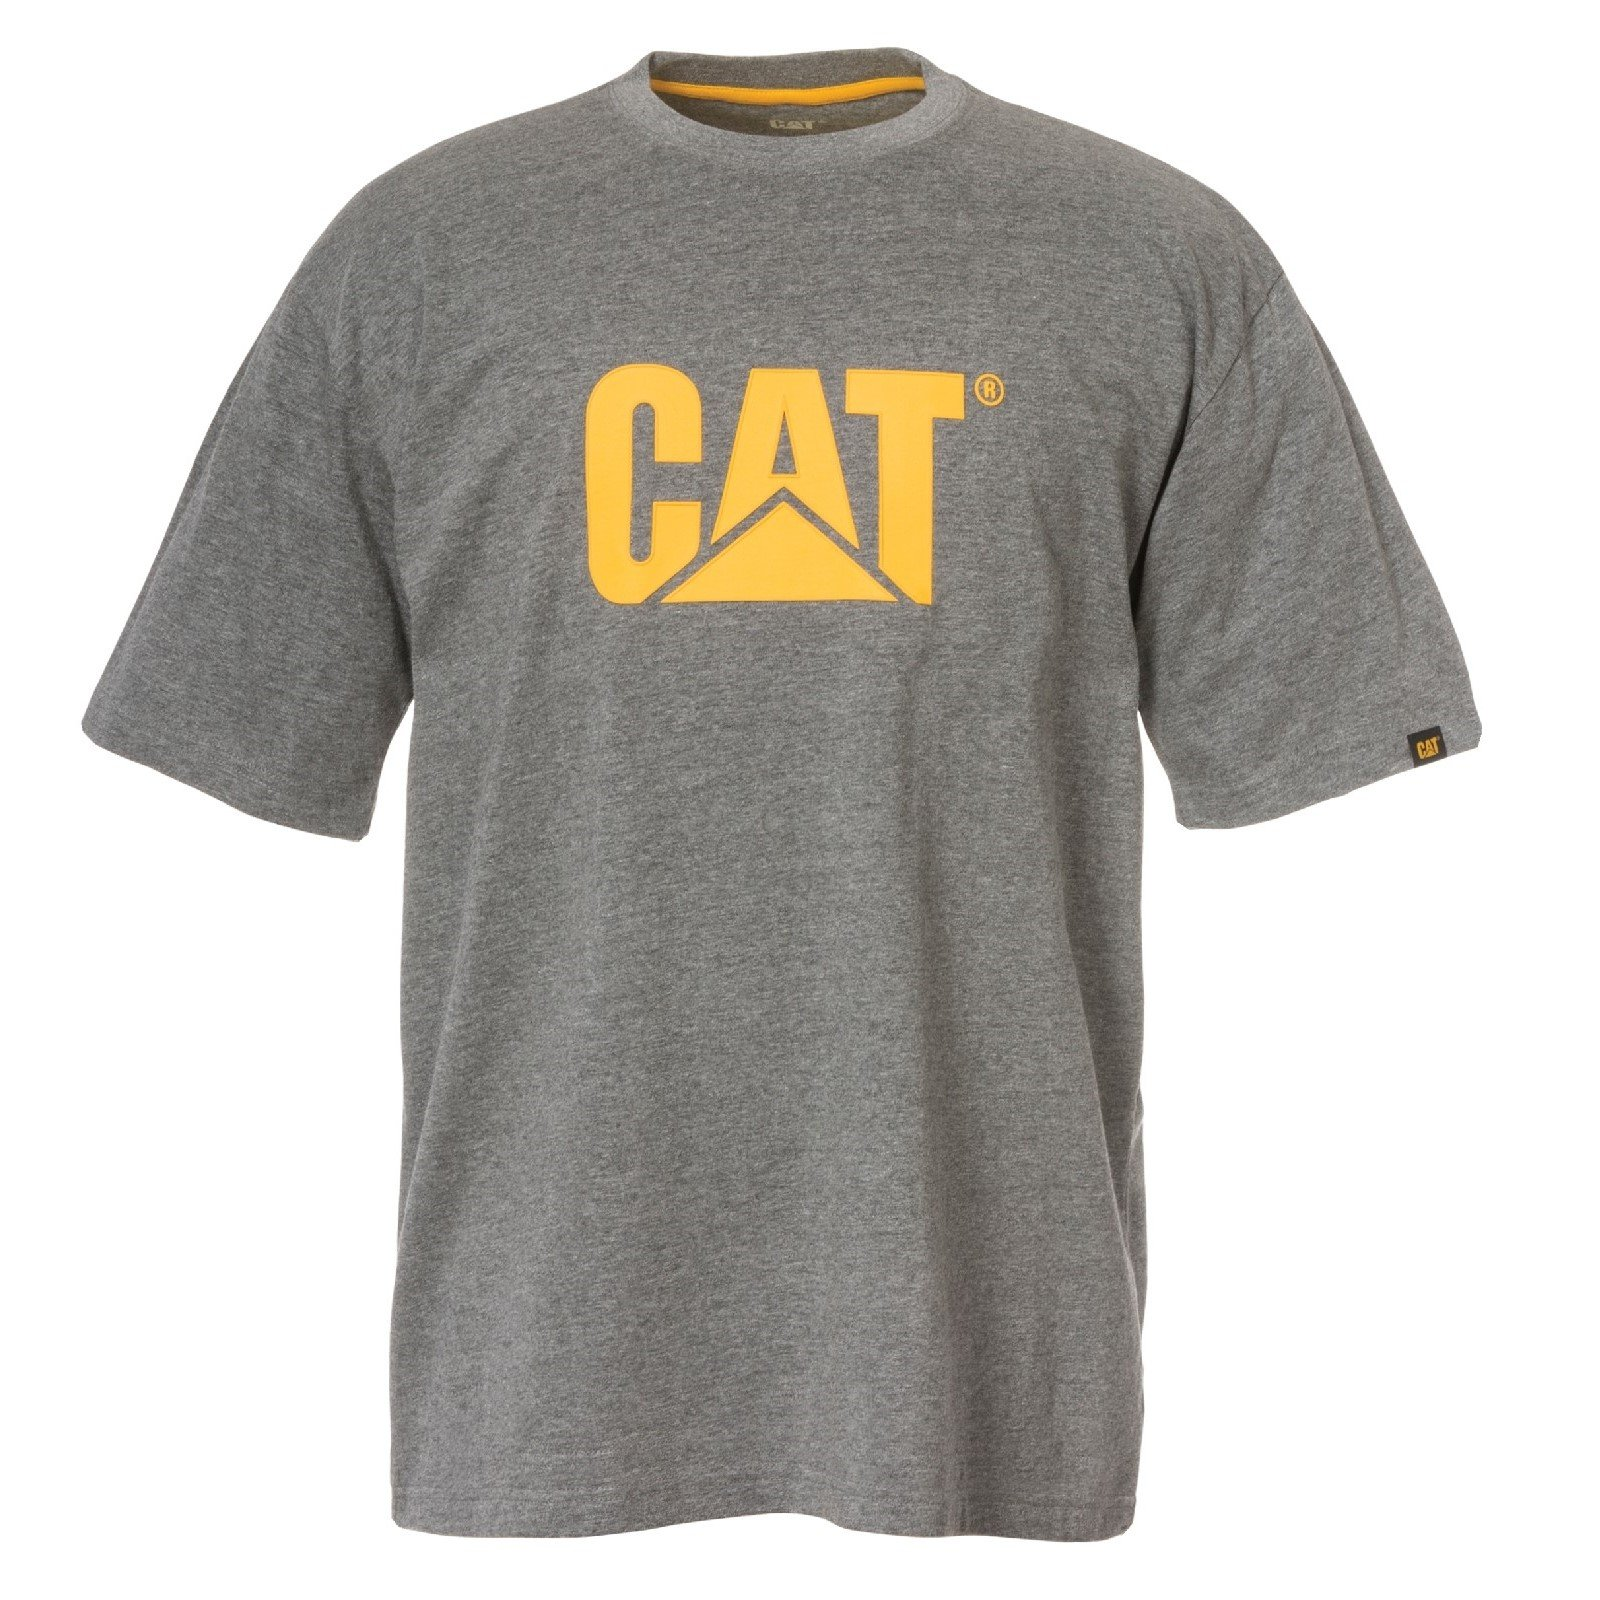 Caterpillar Men's Trademark Logo T-Shirt Various Colours 25301-42086 - Dark Heather Grey Sml